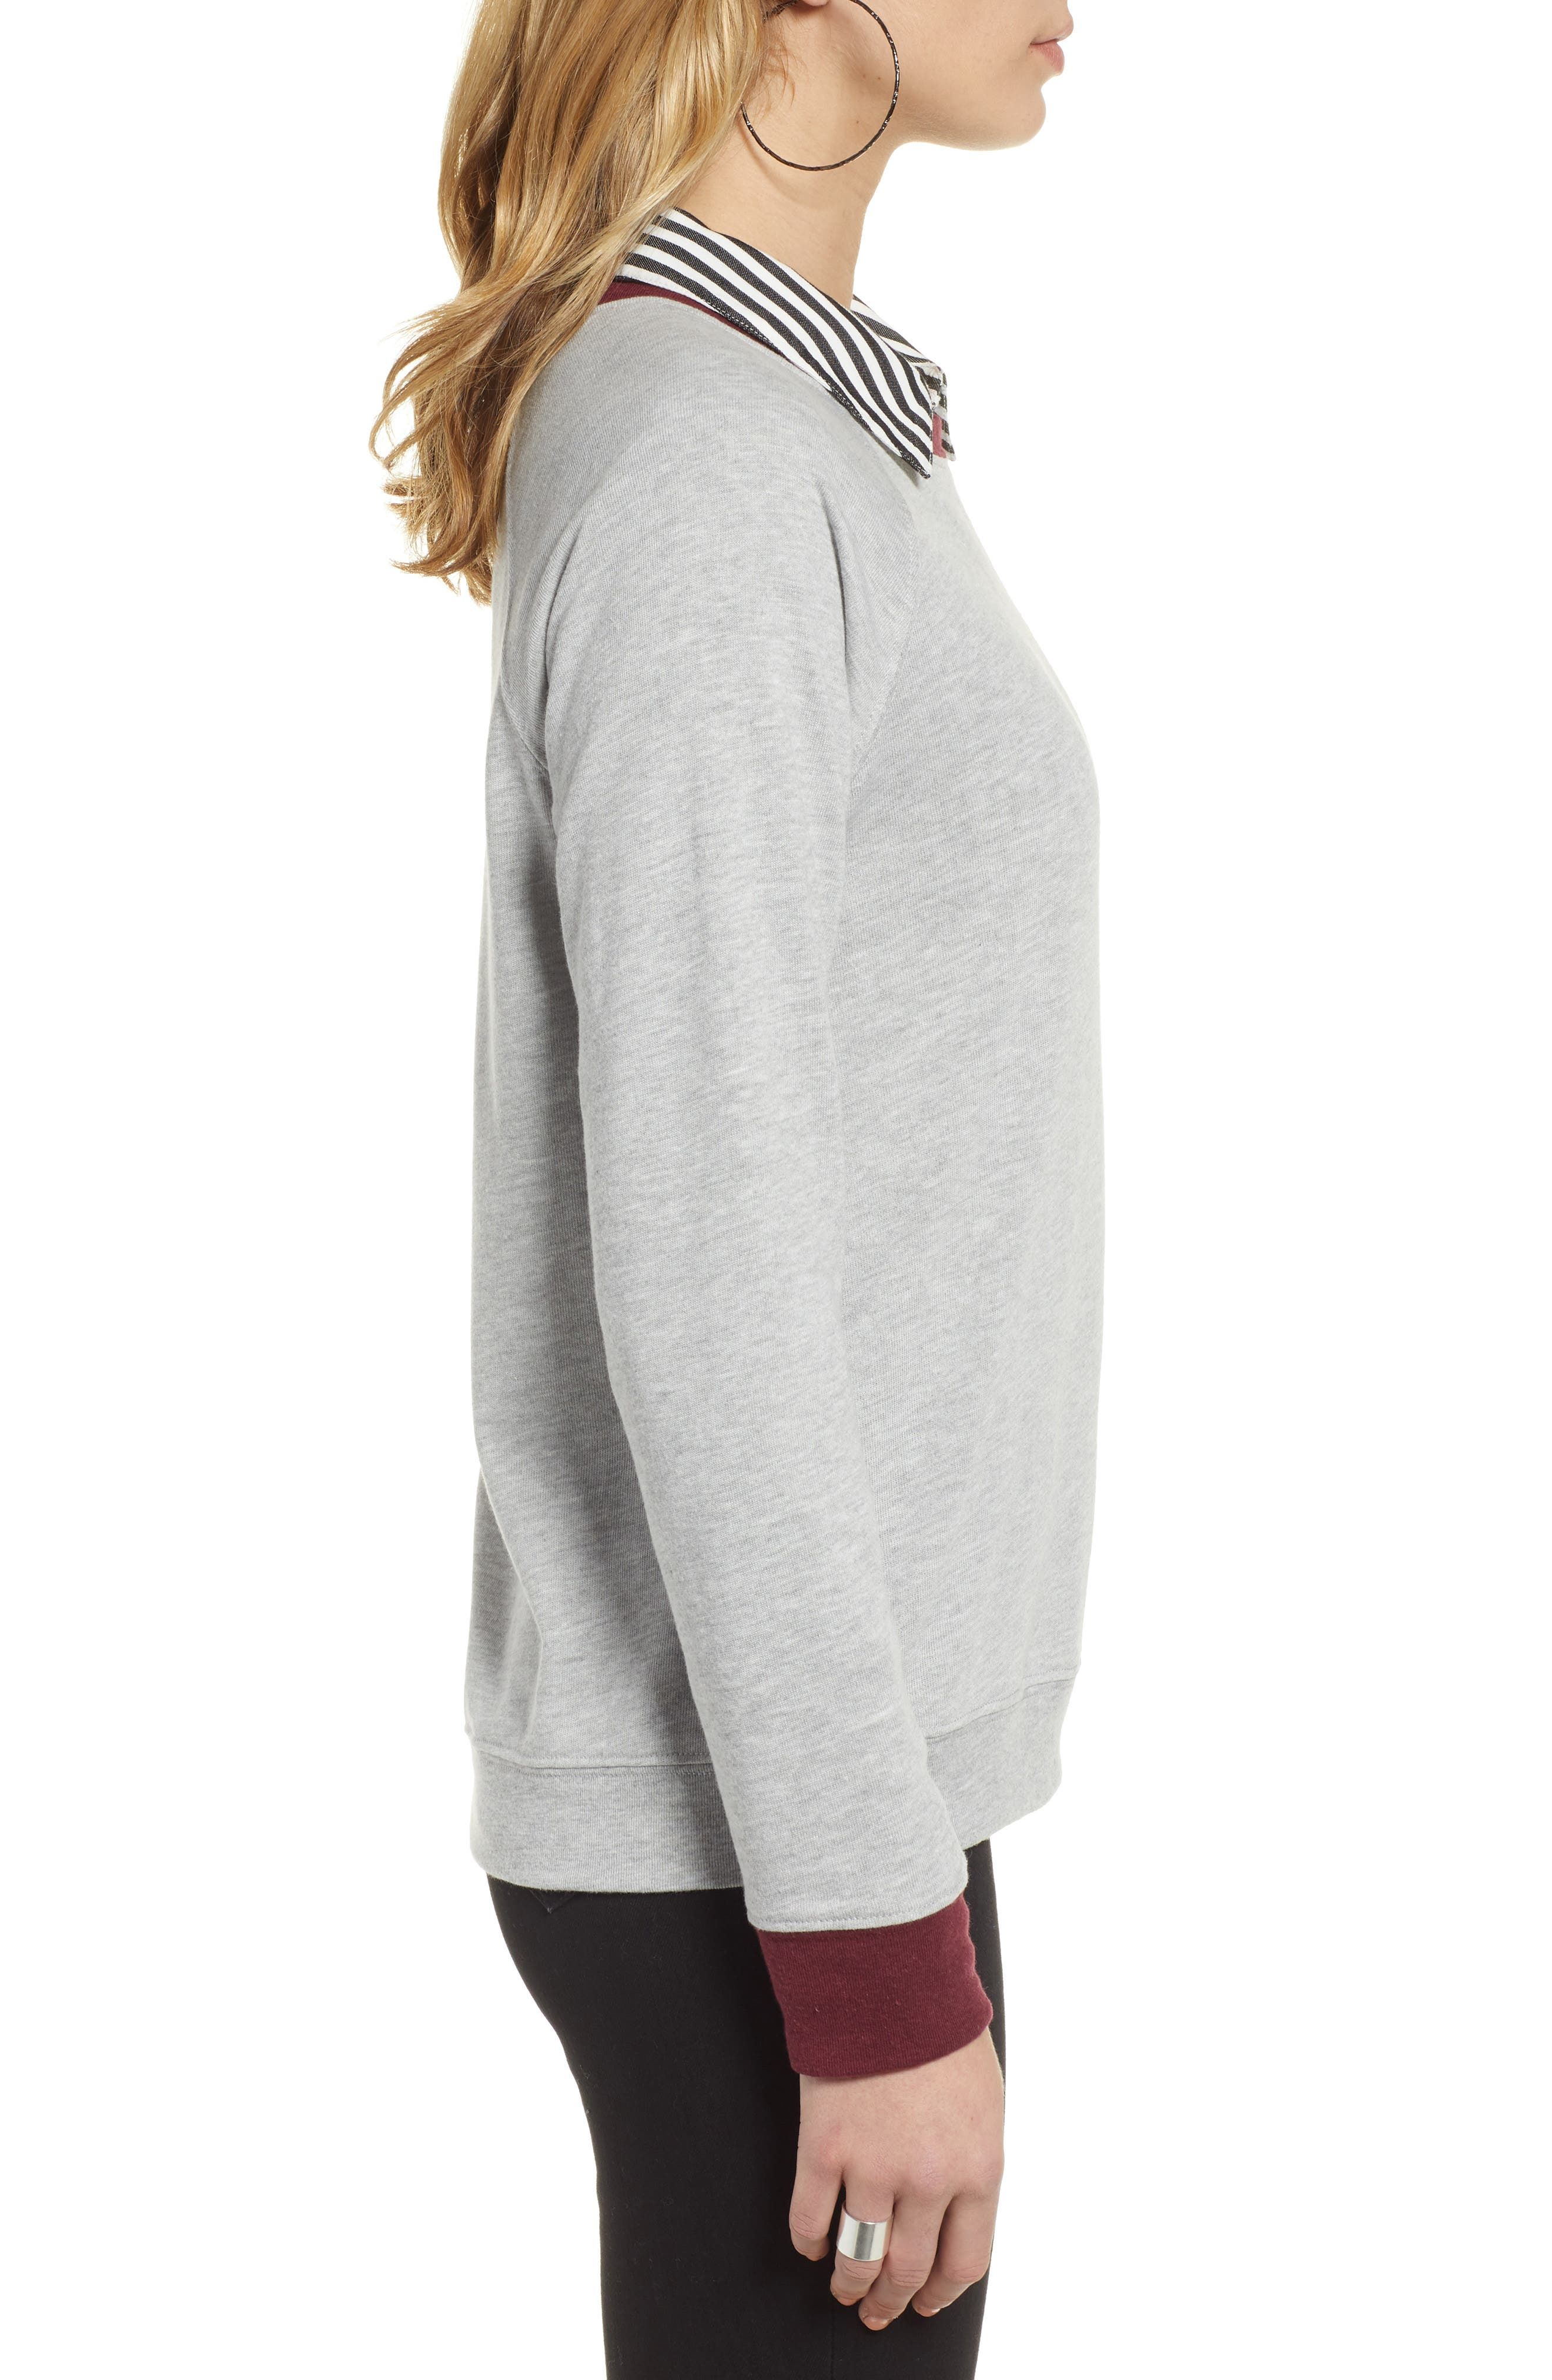 TREASURE & BOND, Crewneck Sweatshirt, Alternate thumbnail 3, color, GREY HEATHER- RED TANNIN COMBO